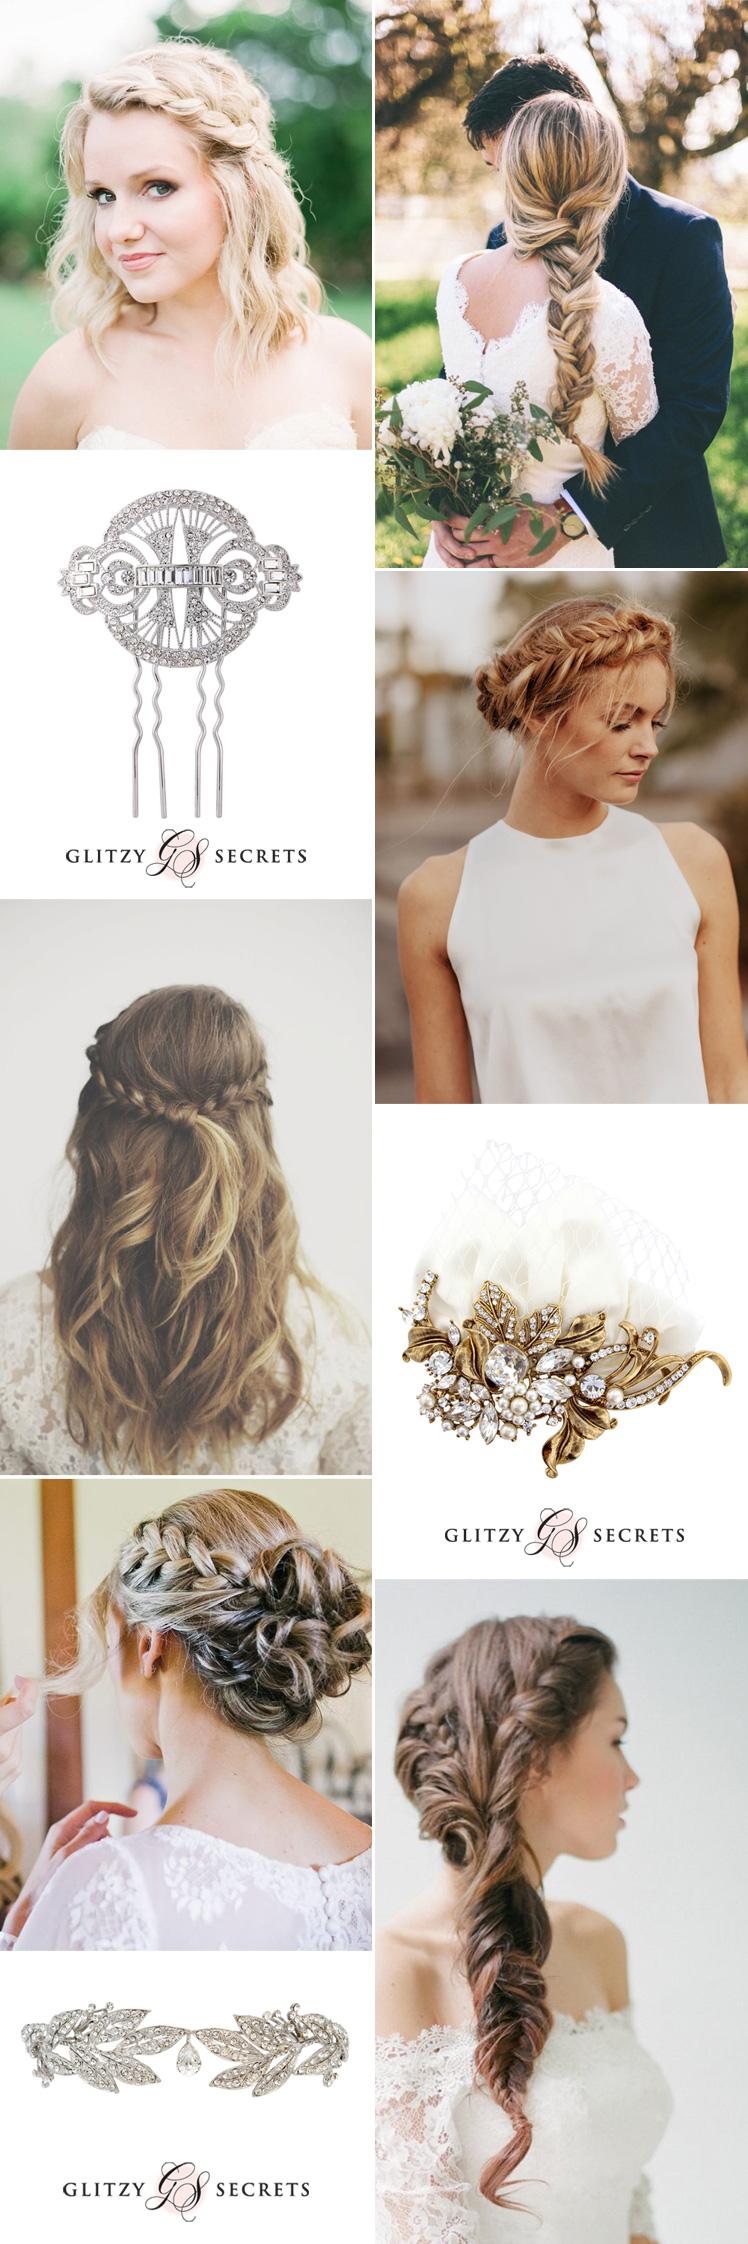 Hair Accessories to Bejewel Your Bridal Braids | Bridal braids, Hair ...